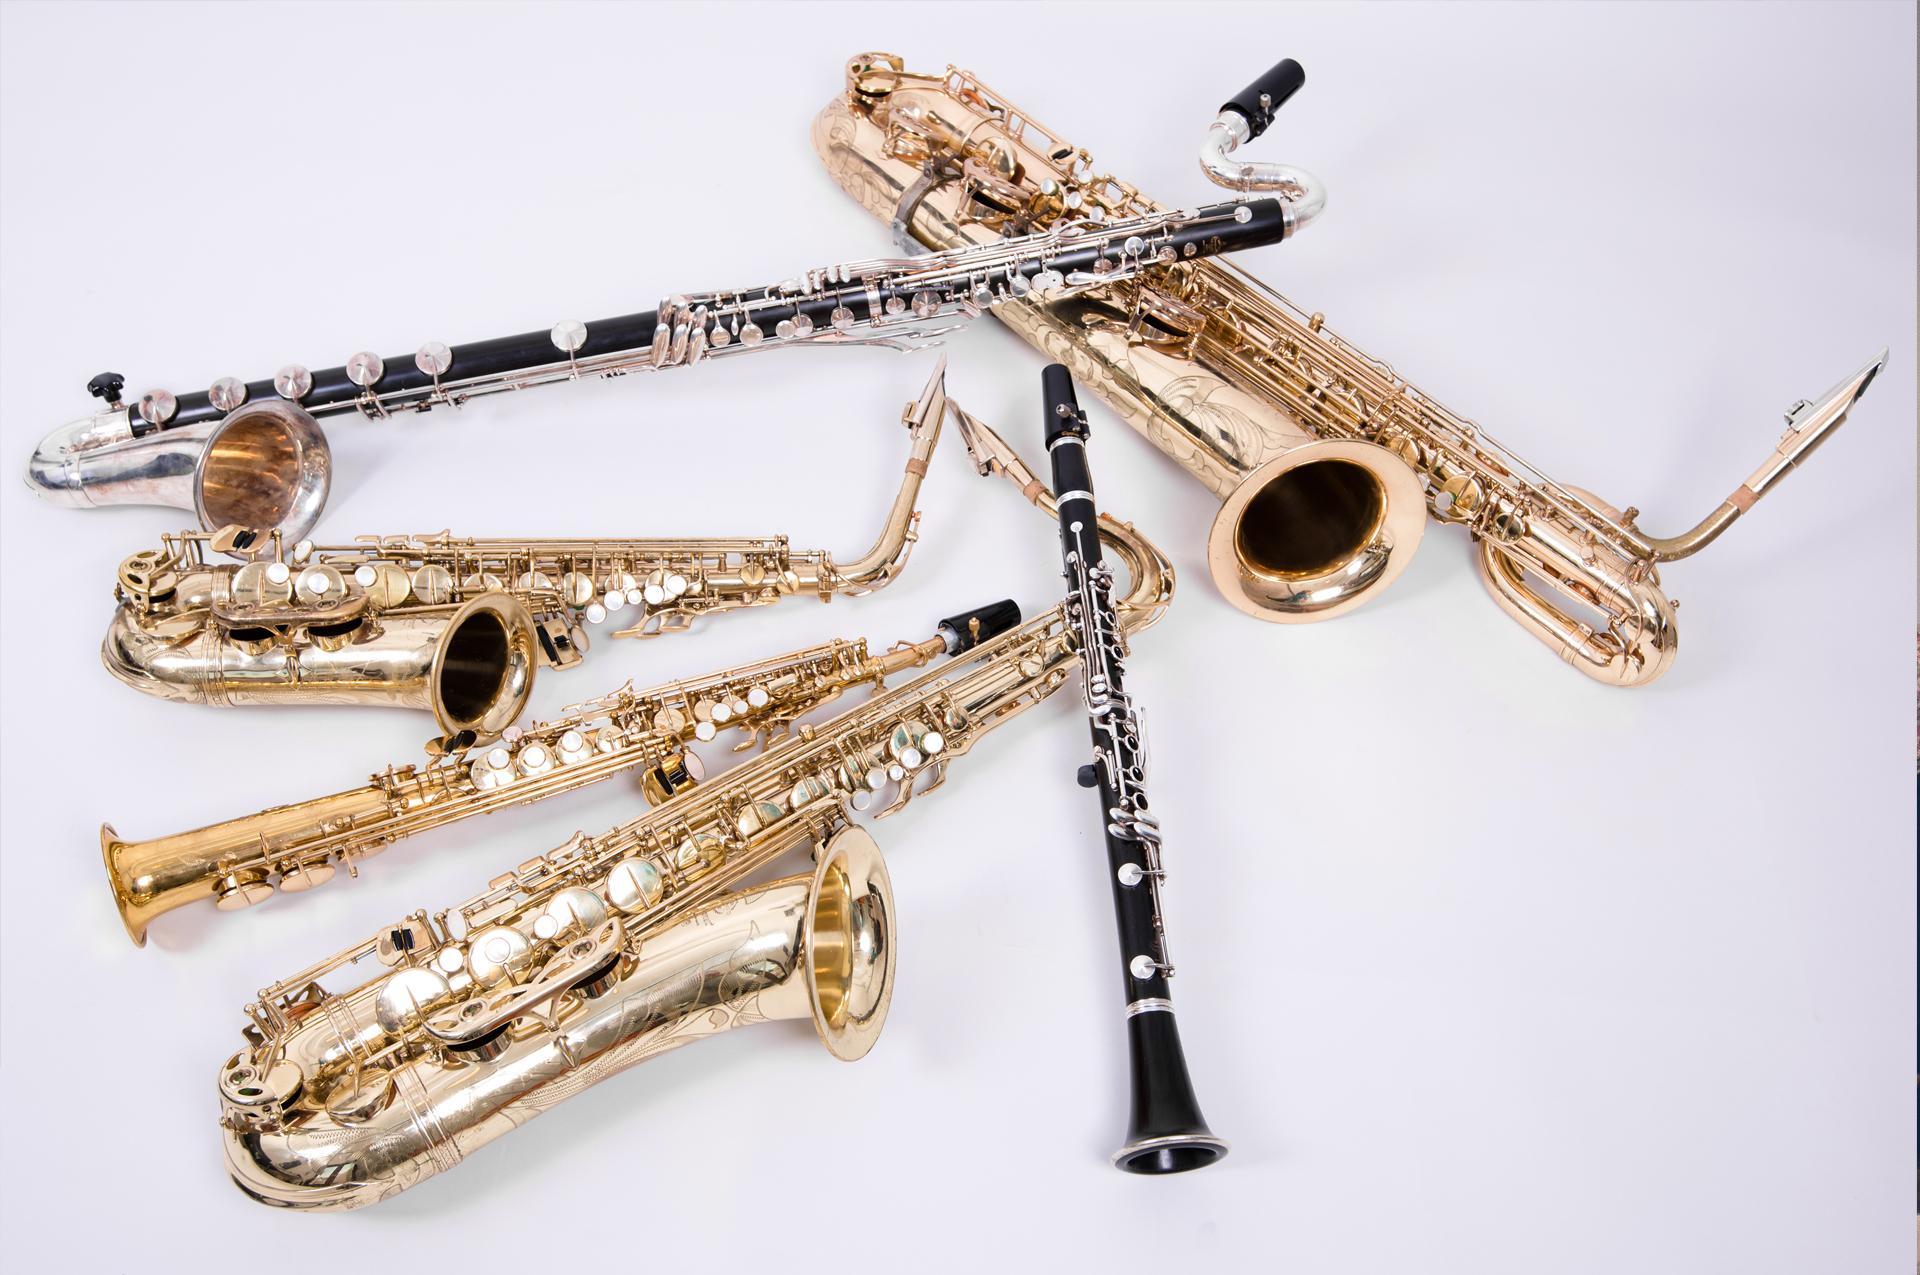 Catherine Shrubshall Musician Clarinet and Saxophone Freelance London